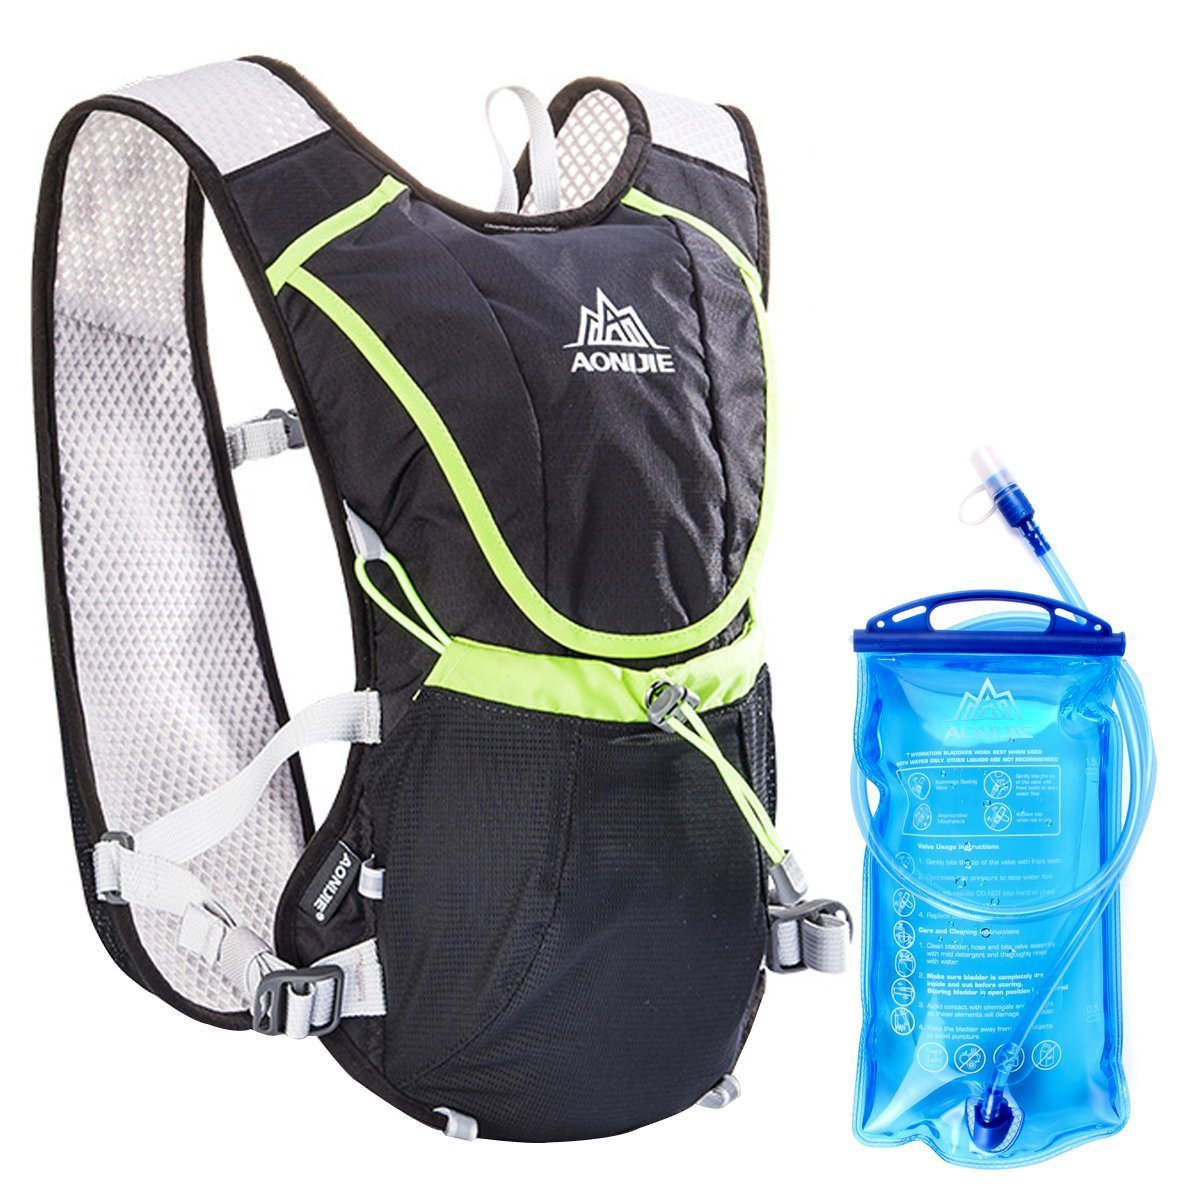 Geila Aire Libre Trail la Competencia de Marat/ón la Hidrataci/ón del Chaleco//Mochila con 1 Sin-BPA Agua de Vejiga